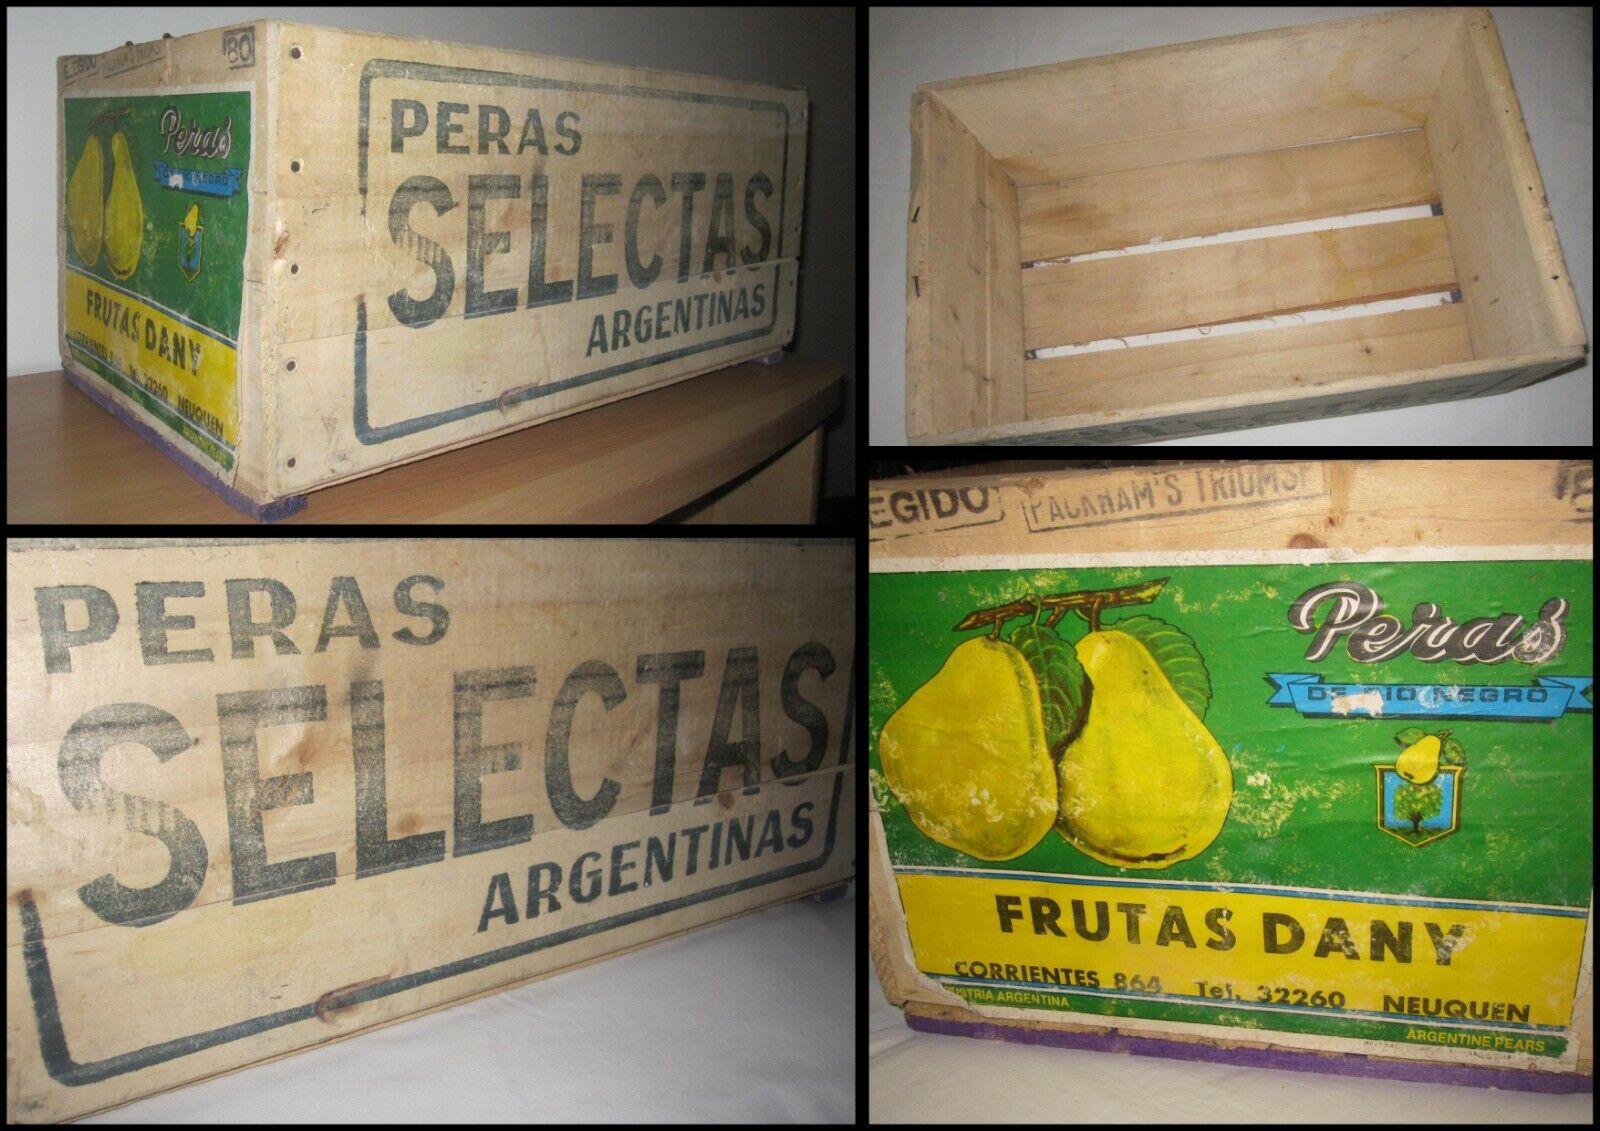 PERA SELECTAS argentooINAS Antica Scatola Cassetta di Frutta in legno Vintage